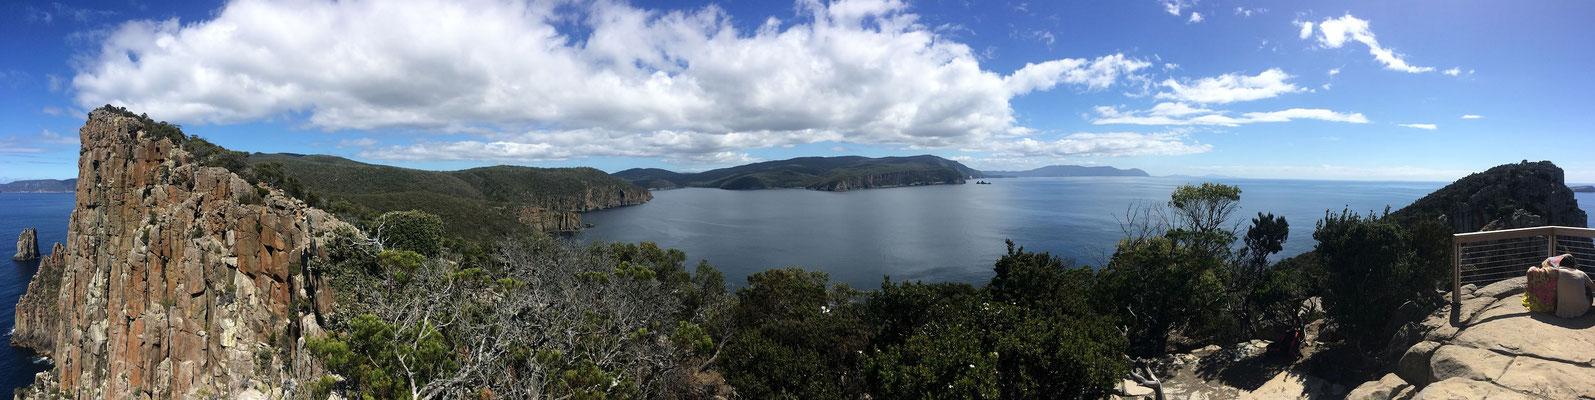 Wanderung zum Cape Hauy